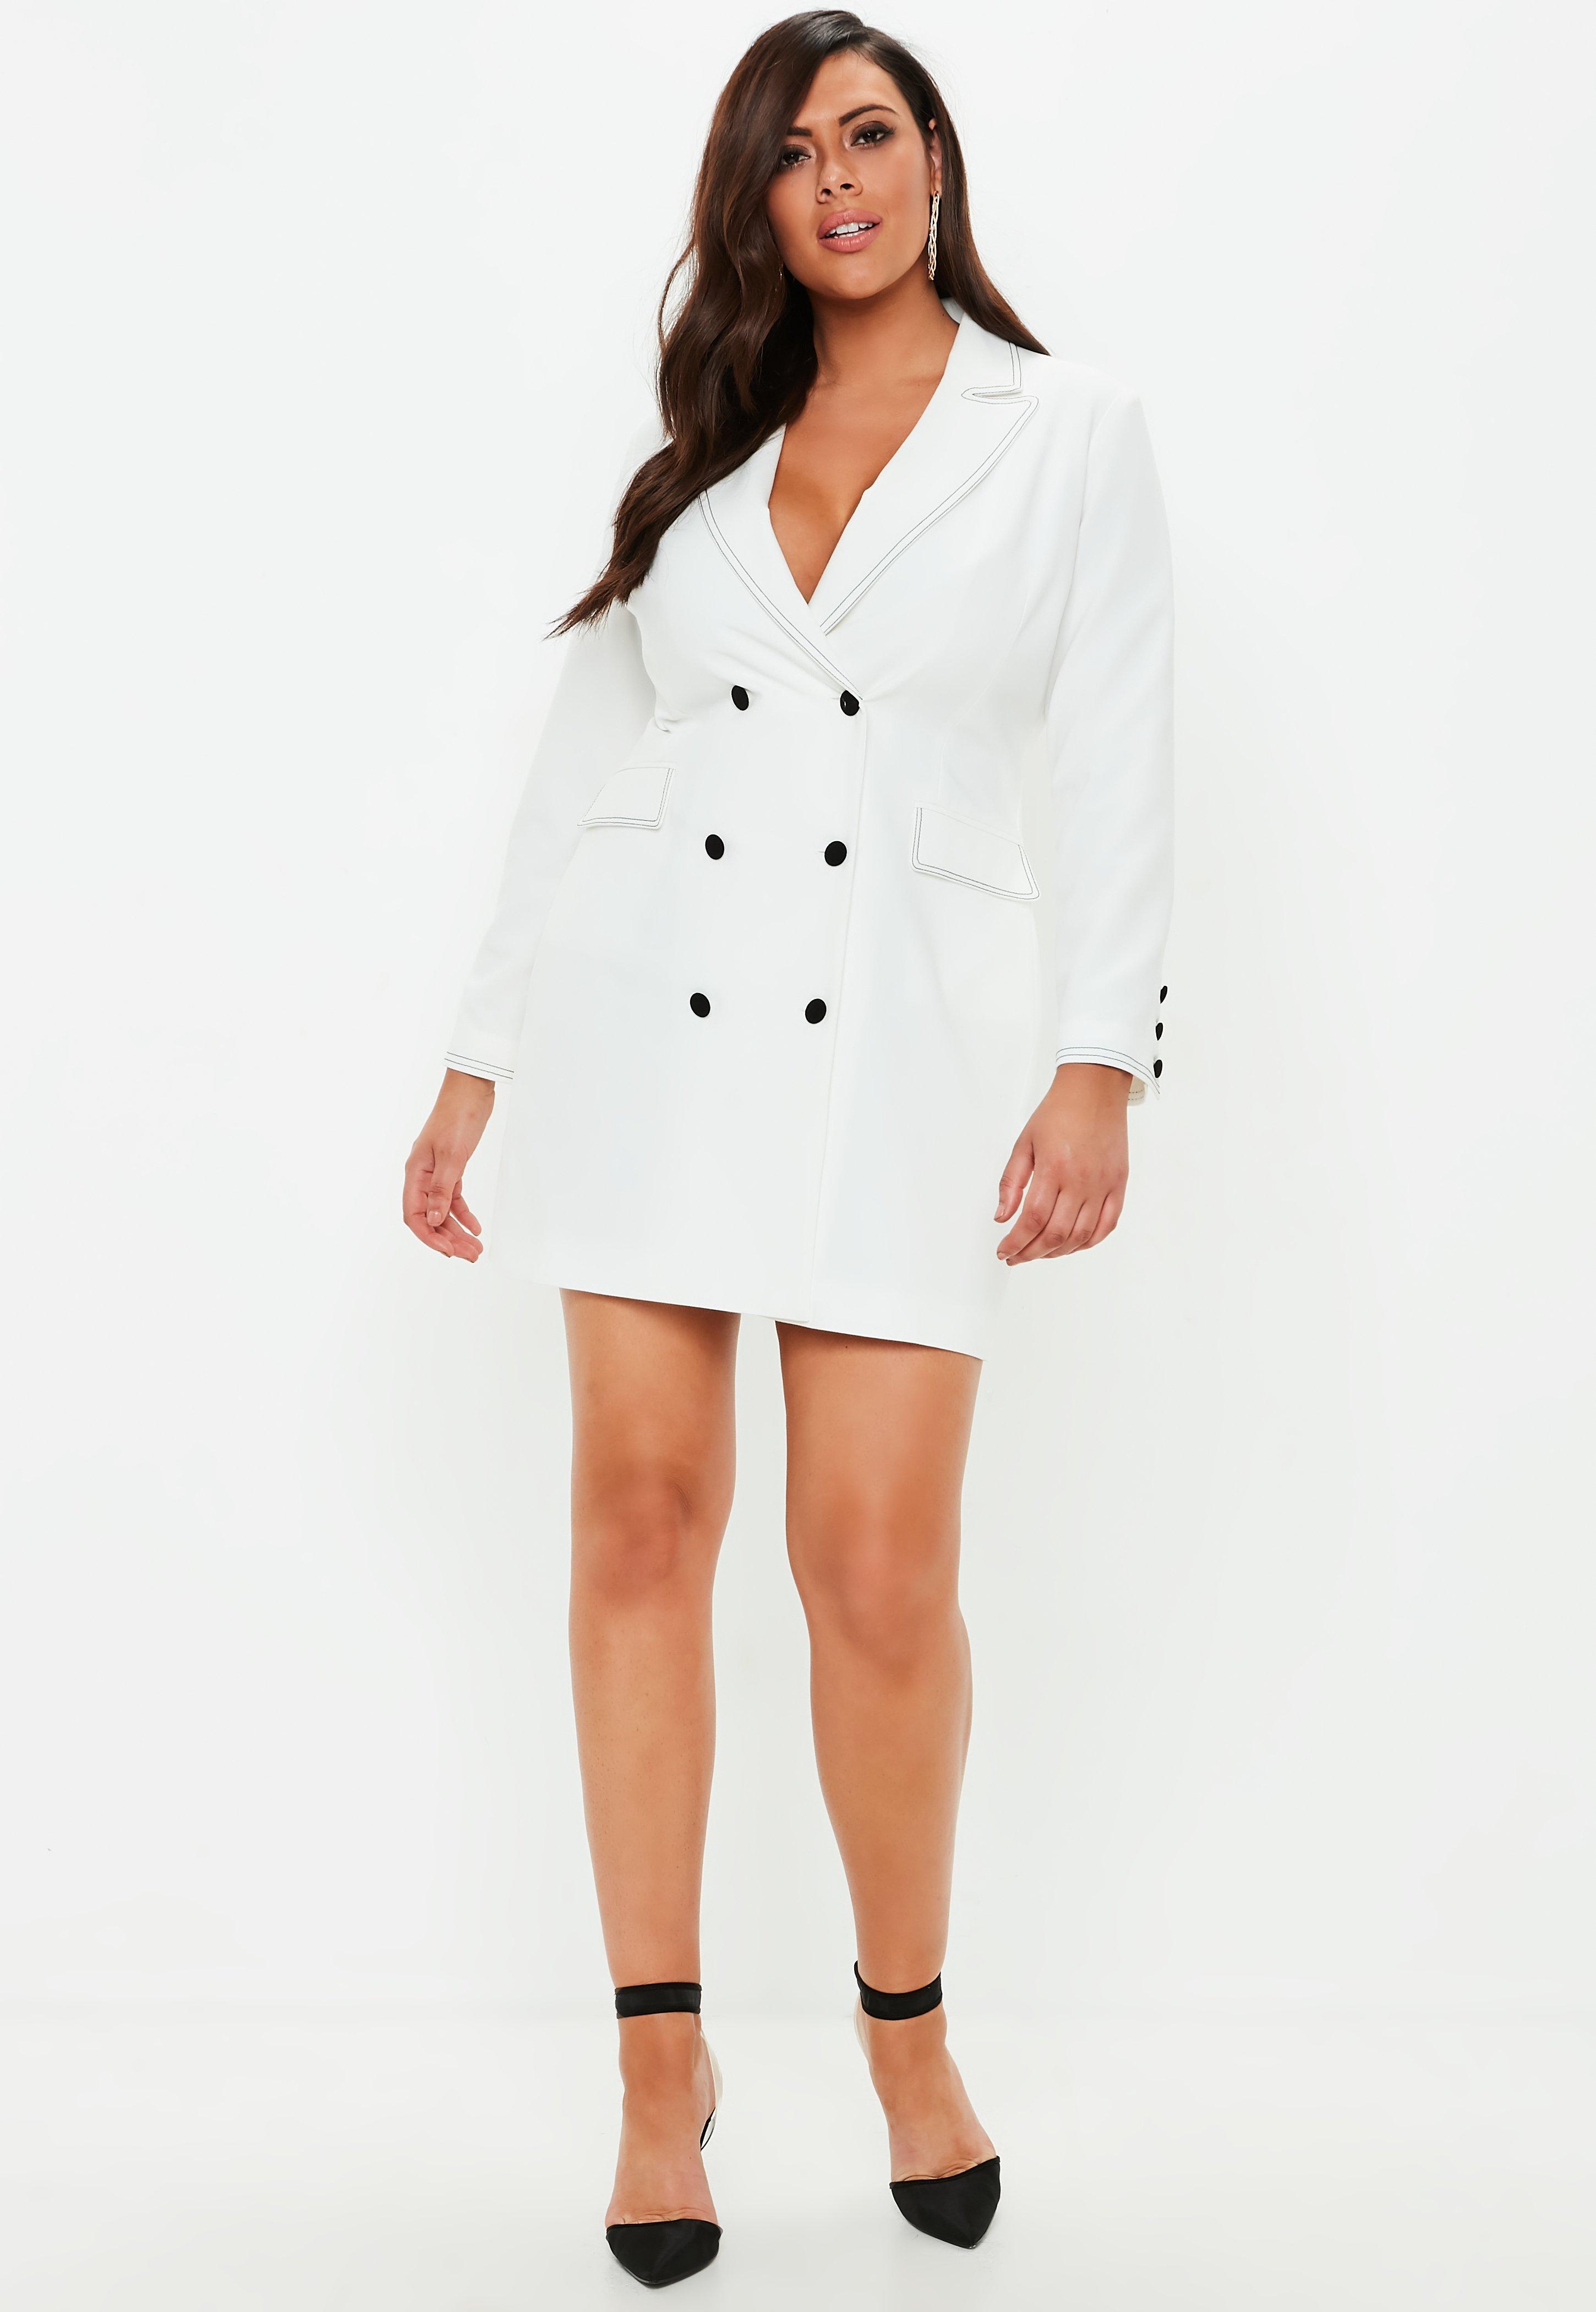 a8d15064ae4 Lyst - Missguided Plus Size White Crepe Contrast Stitch Blazer Dress ...